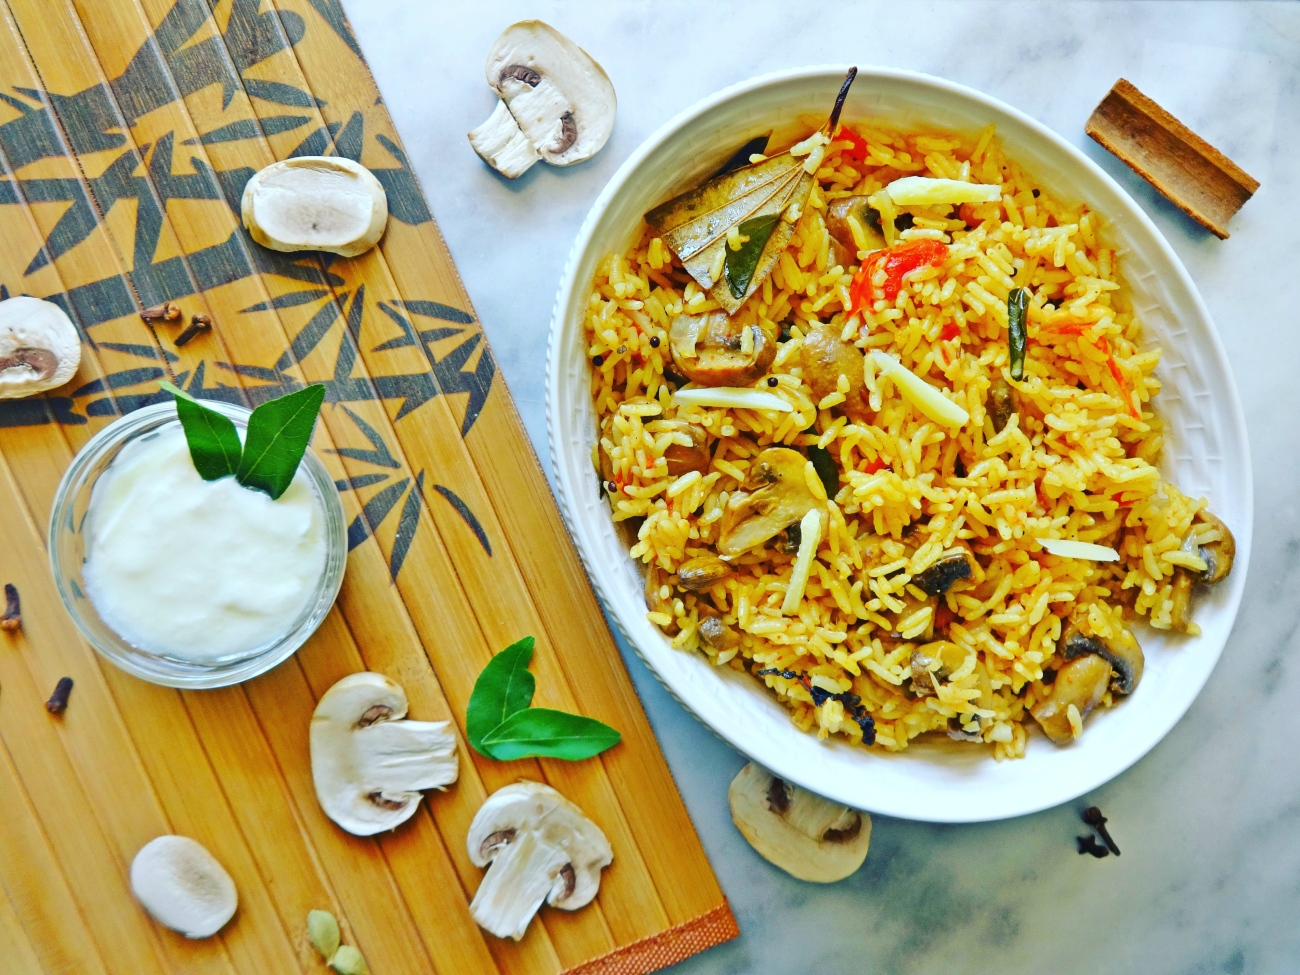 Mushroom rice with home made spice masala